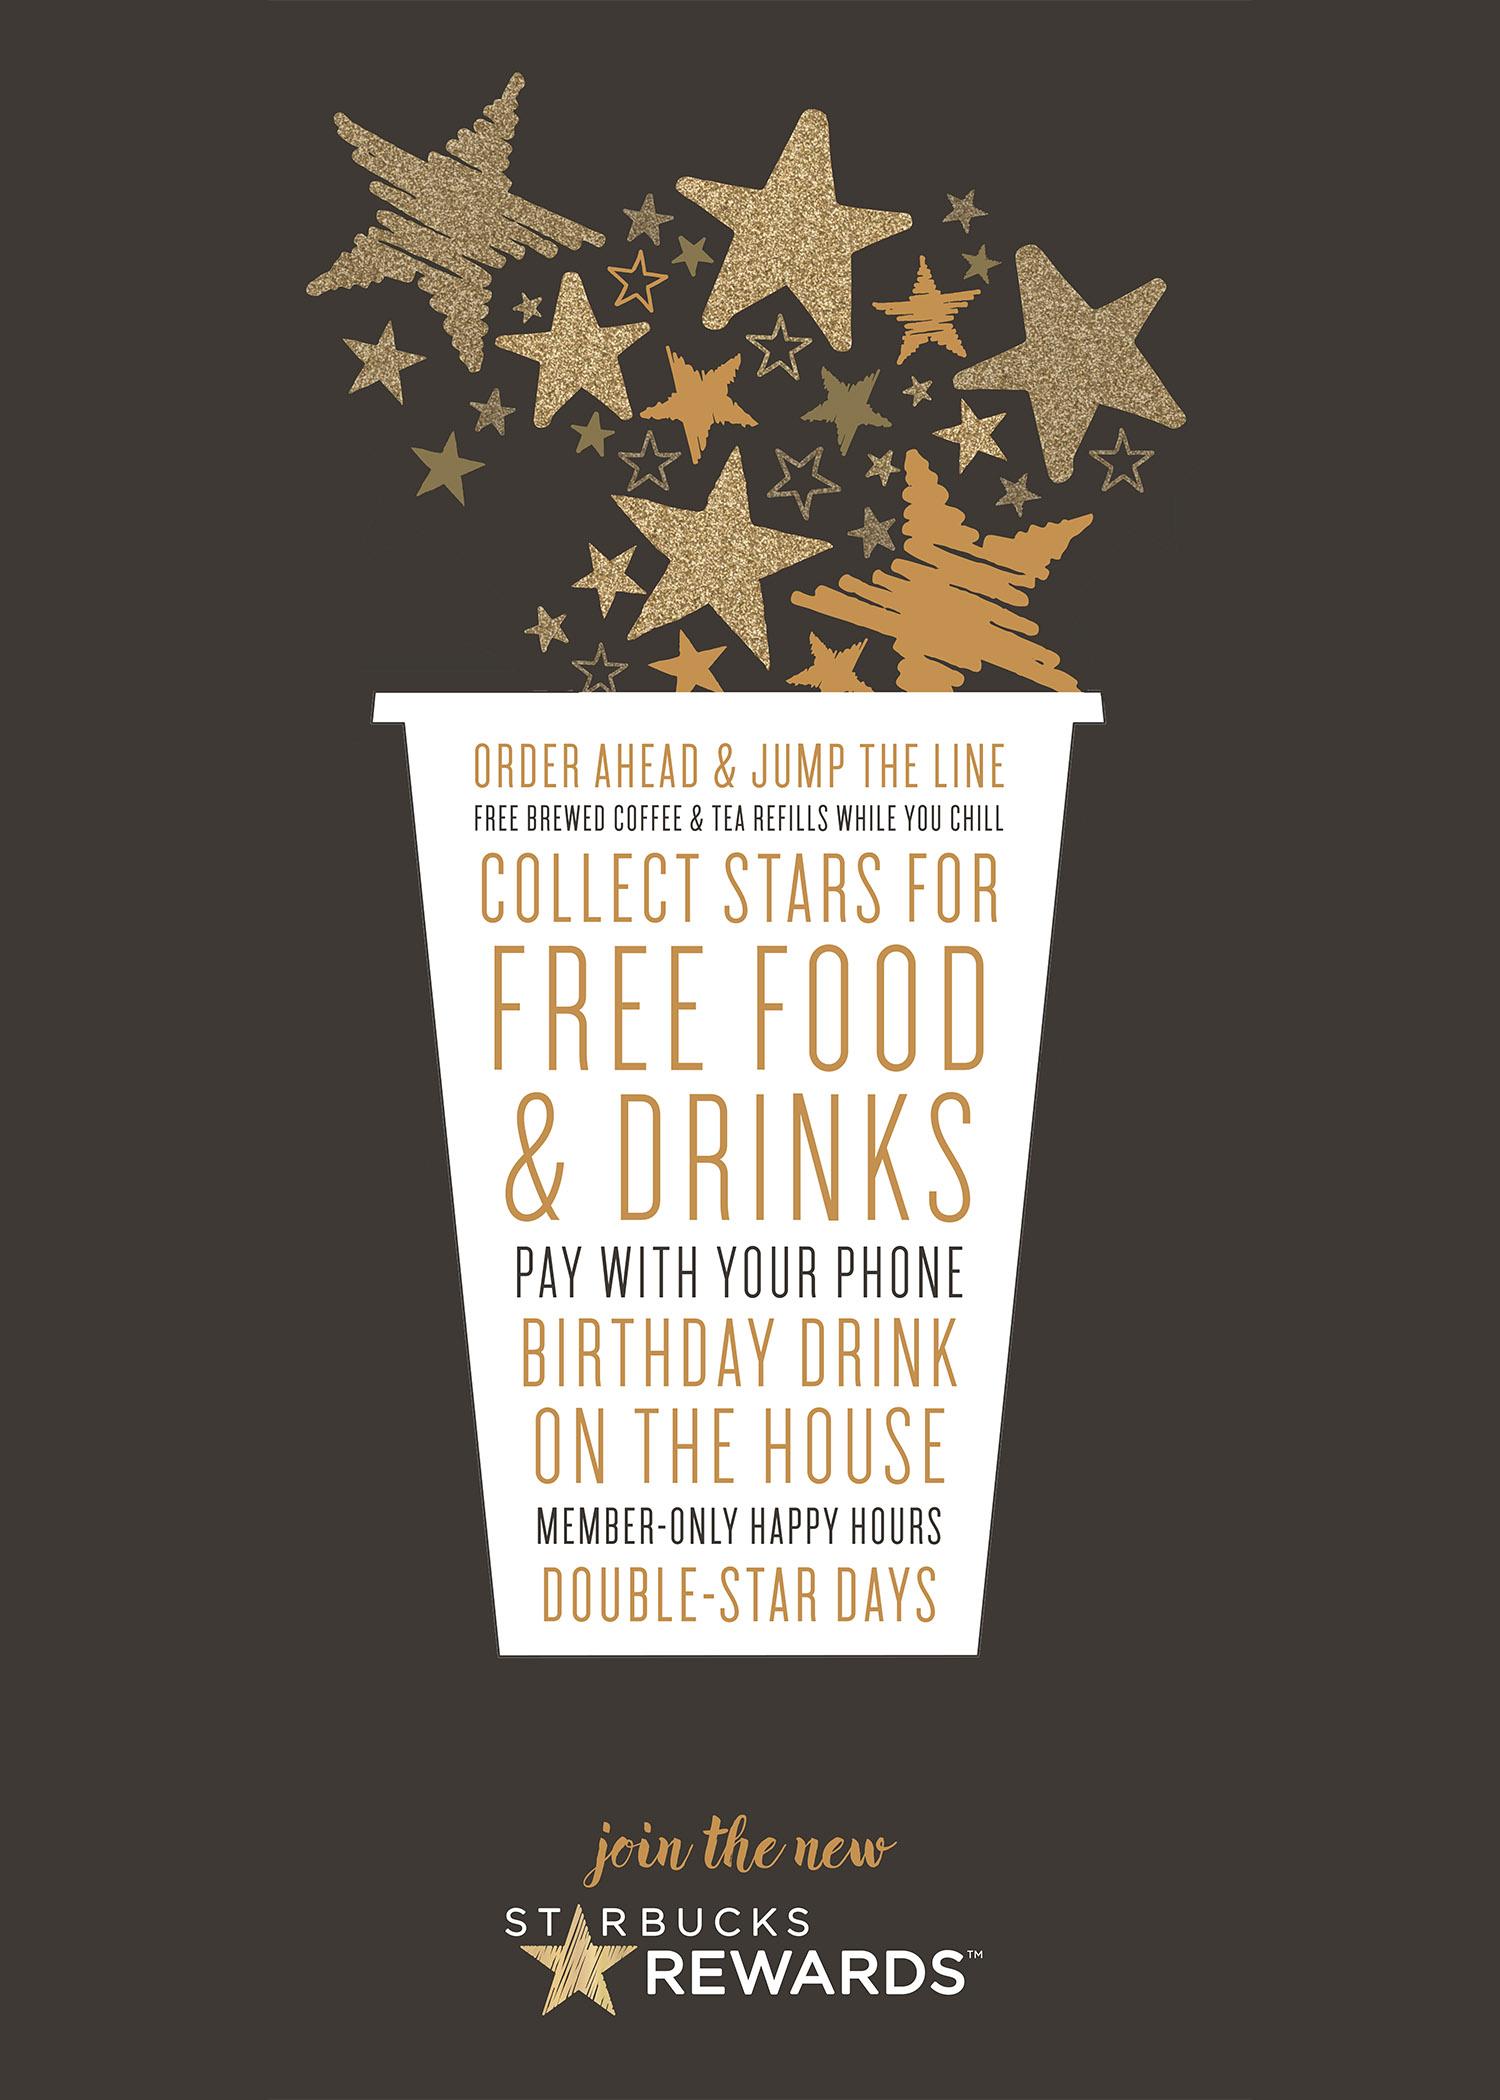 Starbucksrewardsbenefitsjpg - Software to create invoices free download starbucks online store